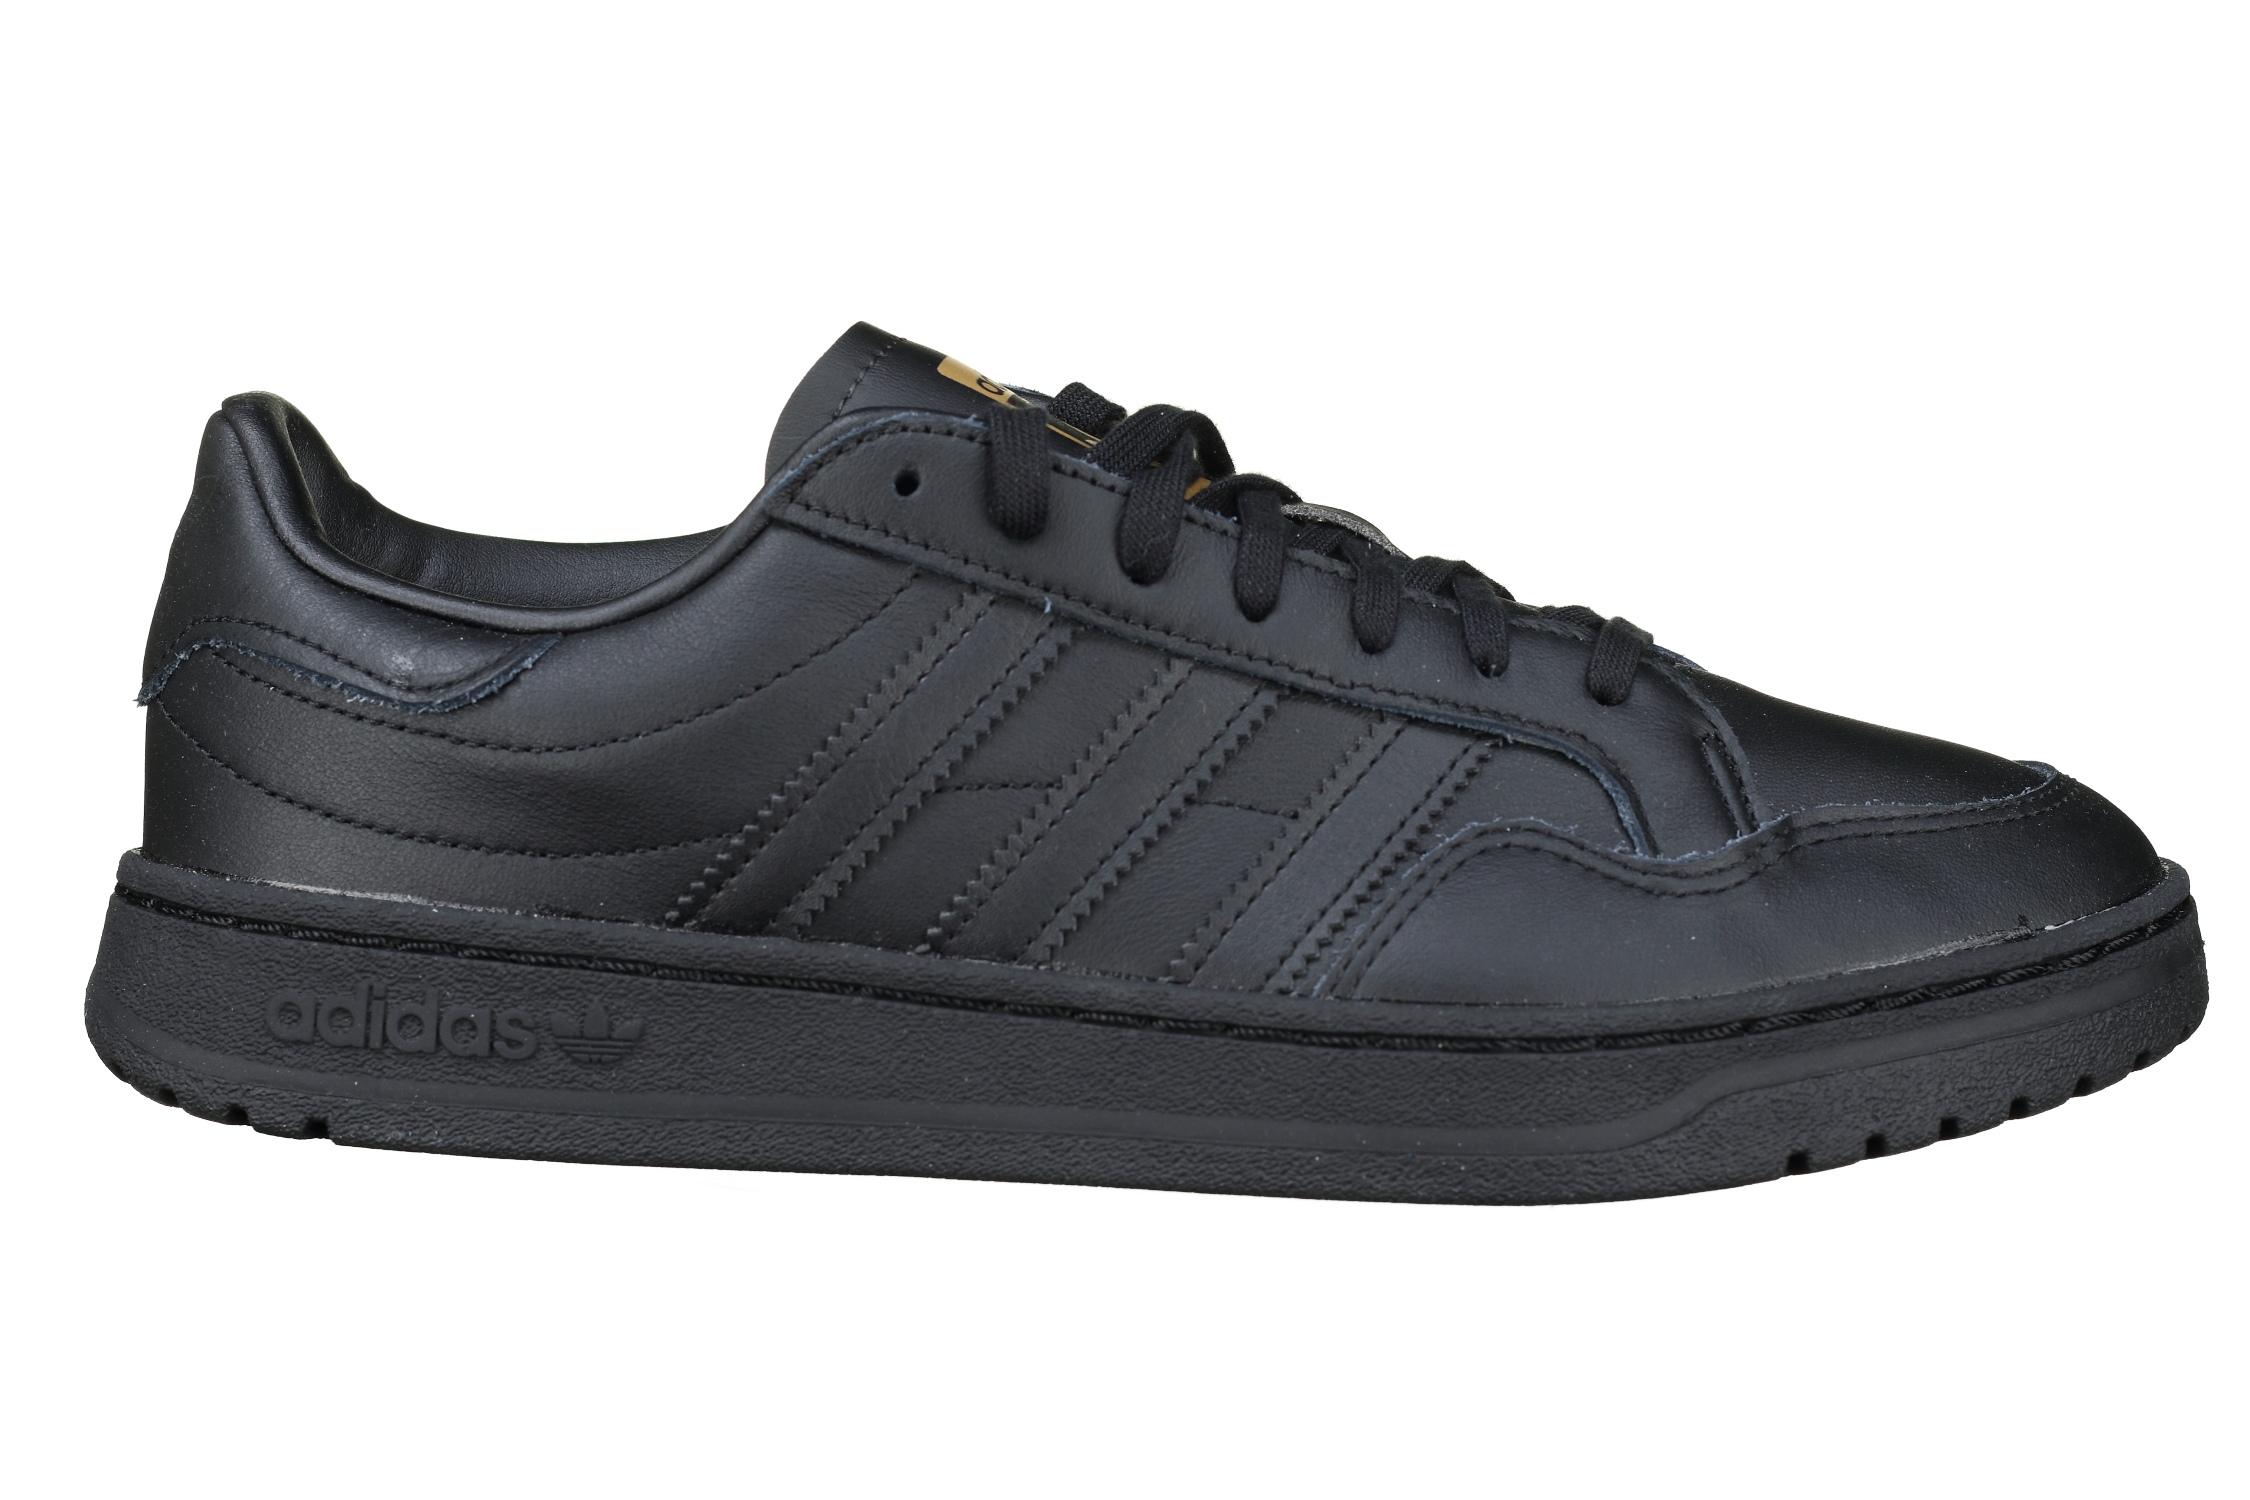 https://www.leadermode.com/184916/adidas-team-court-ef6950-noir.jpg